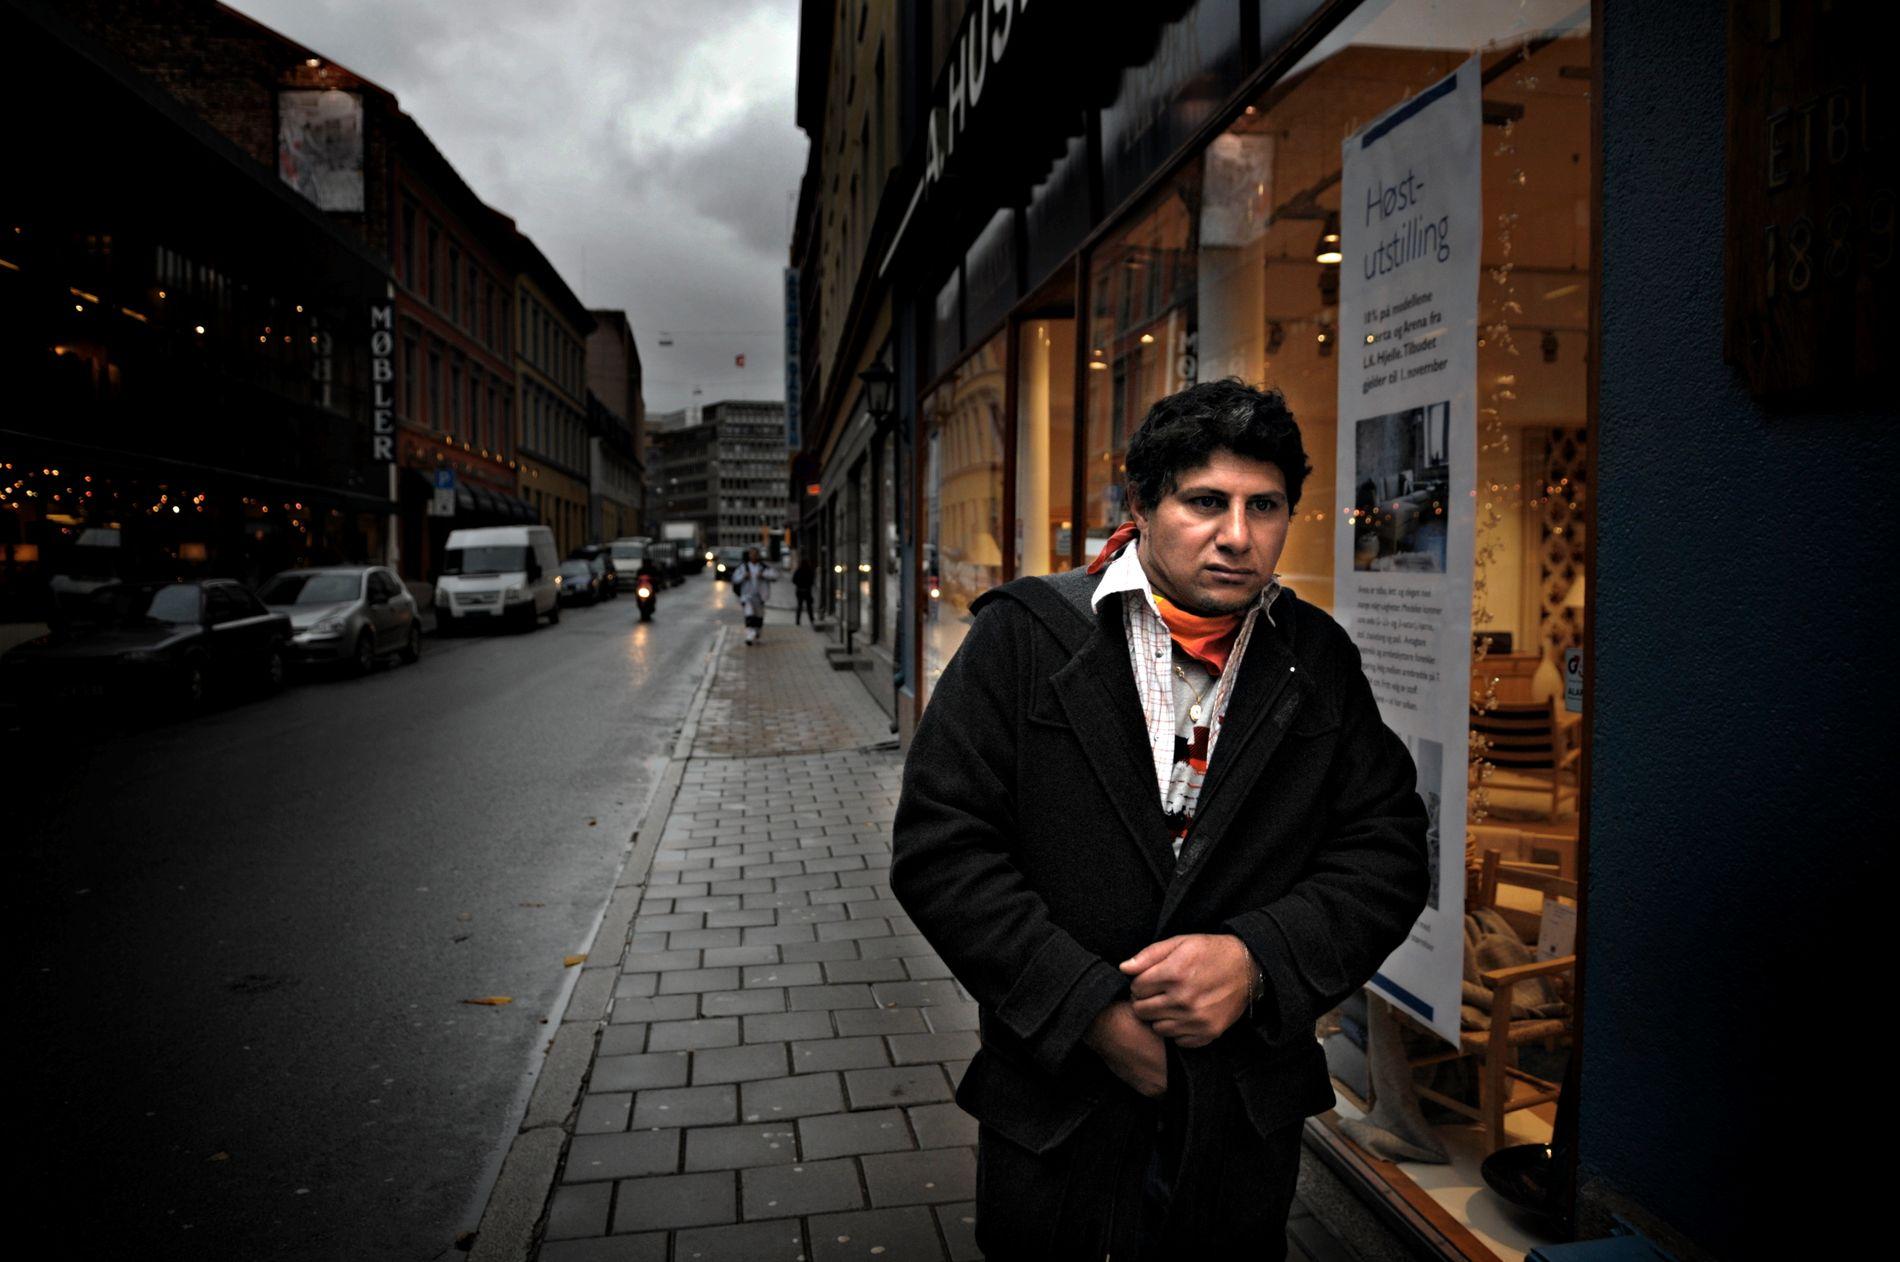 Kaltham Alexander Lie mener koranen er problemet